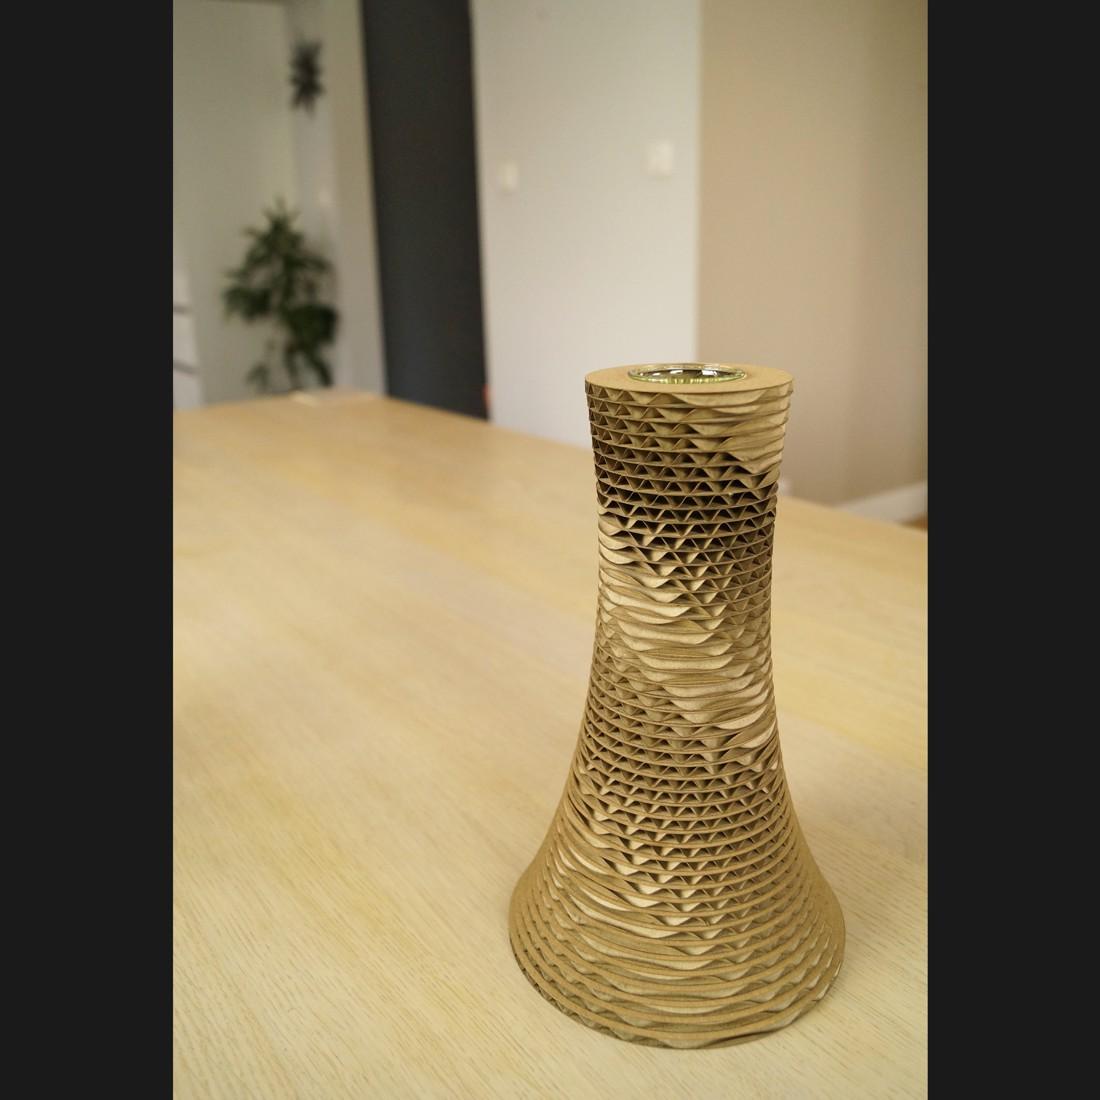 grand vase envol atelier thorey atelier thorey. Black Bedroom Furniture Sets. Home Design Ideas